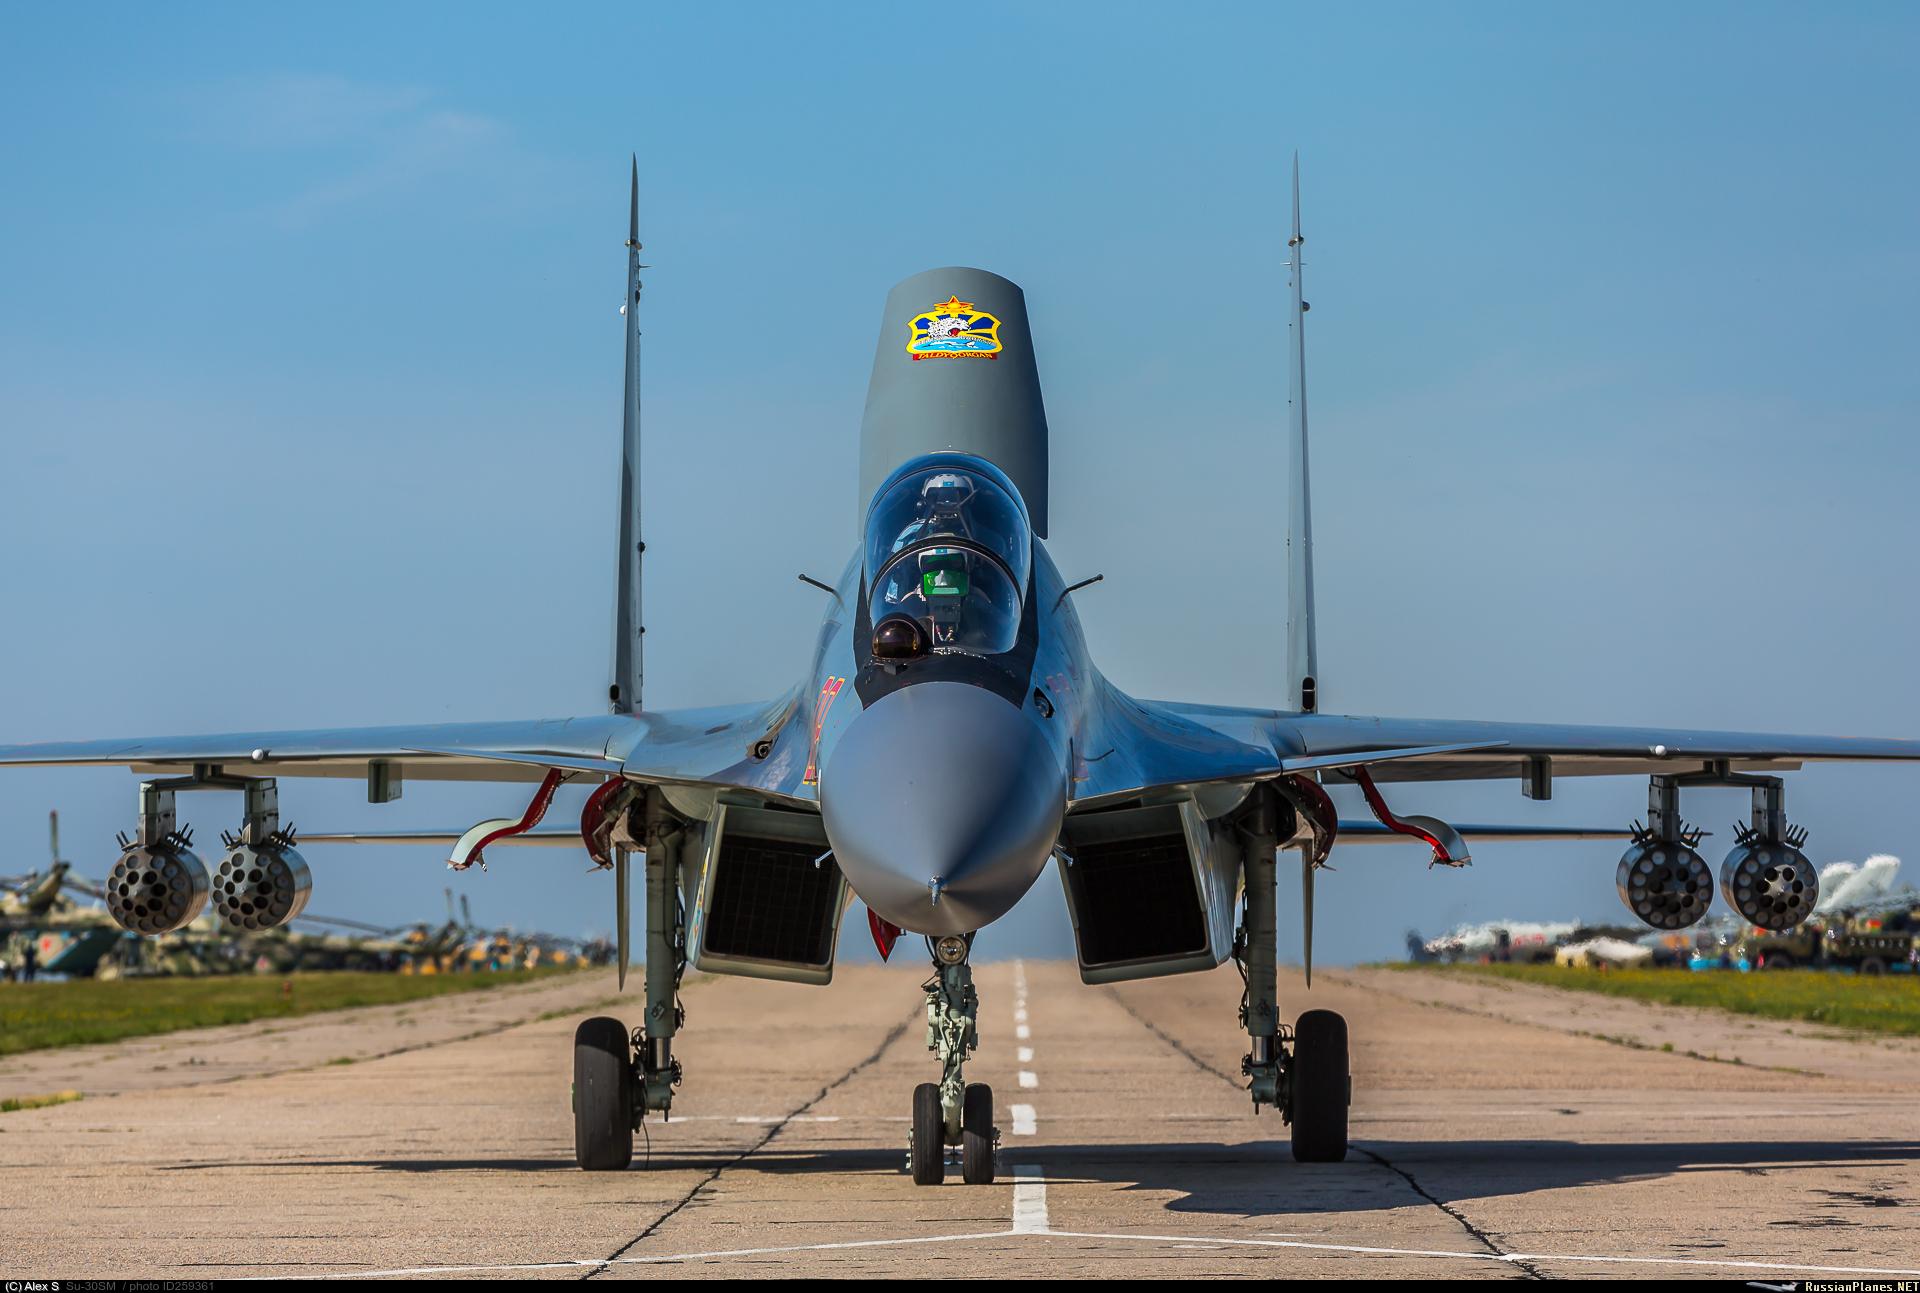 https://russianplanes.net/images/to260000/259361.jpg